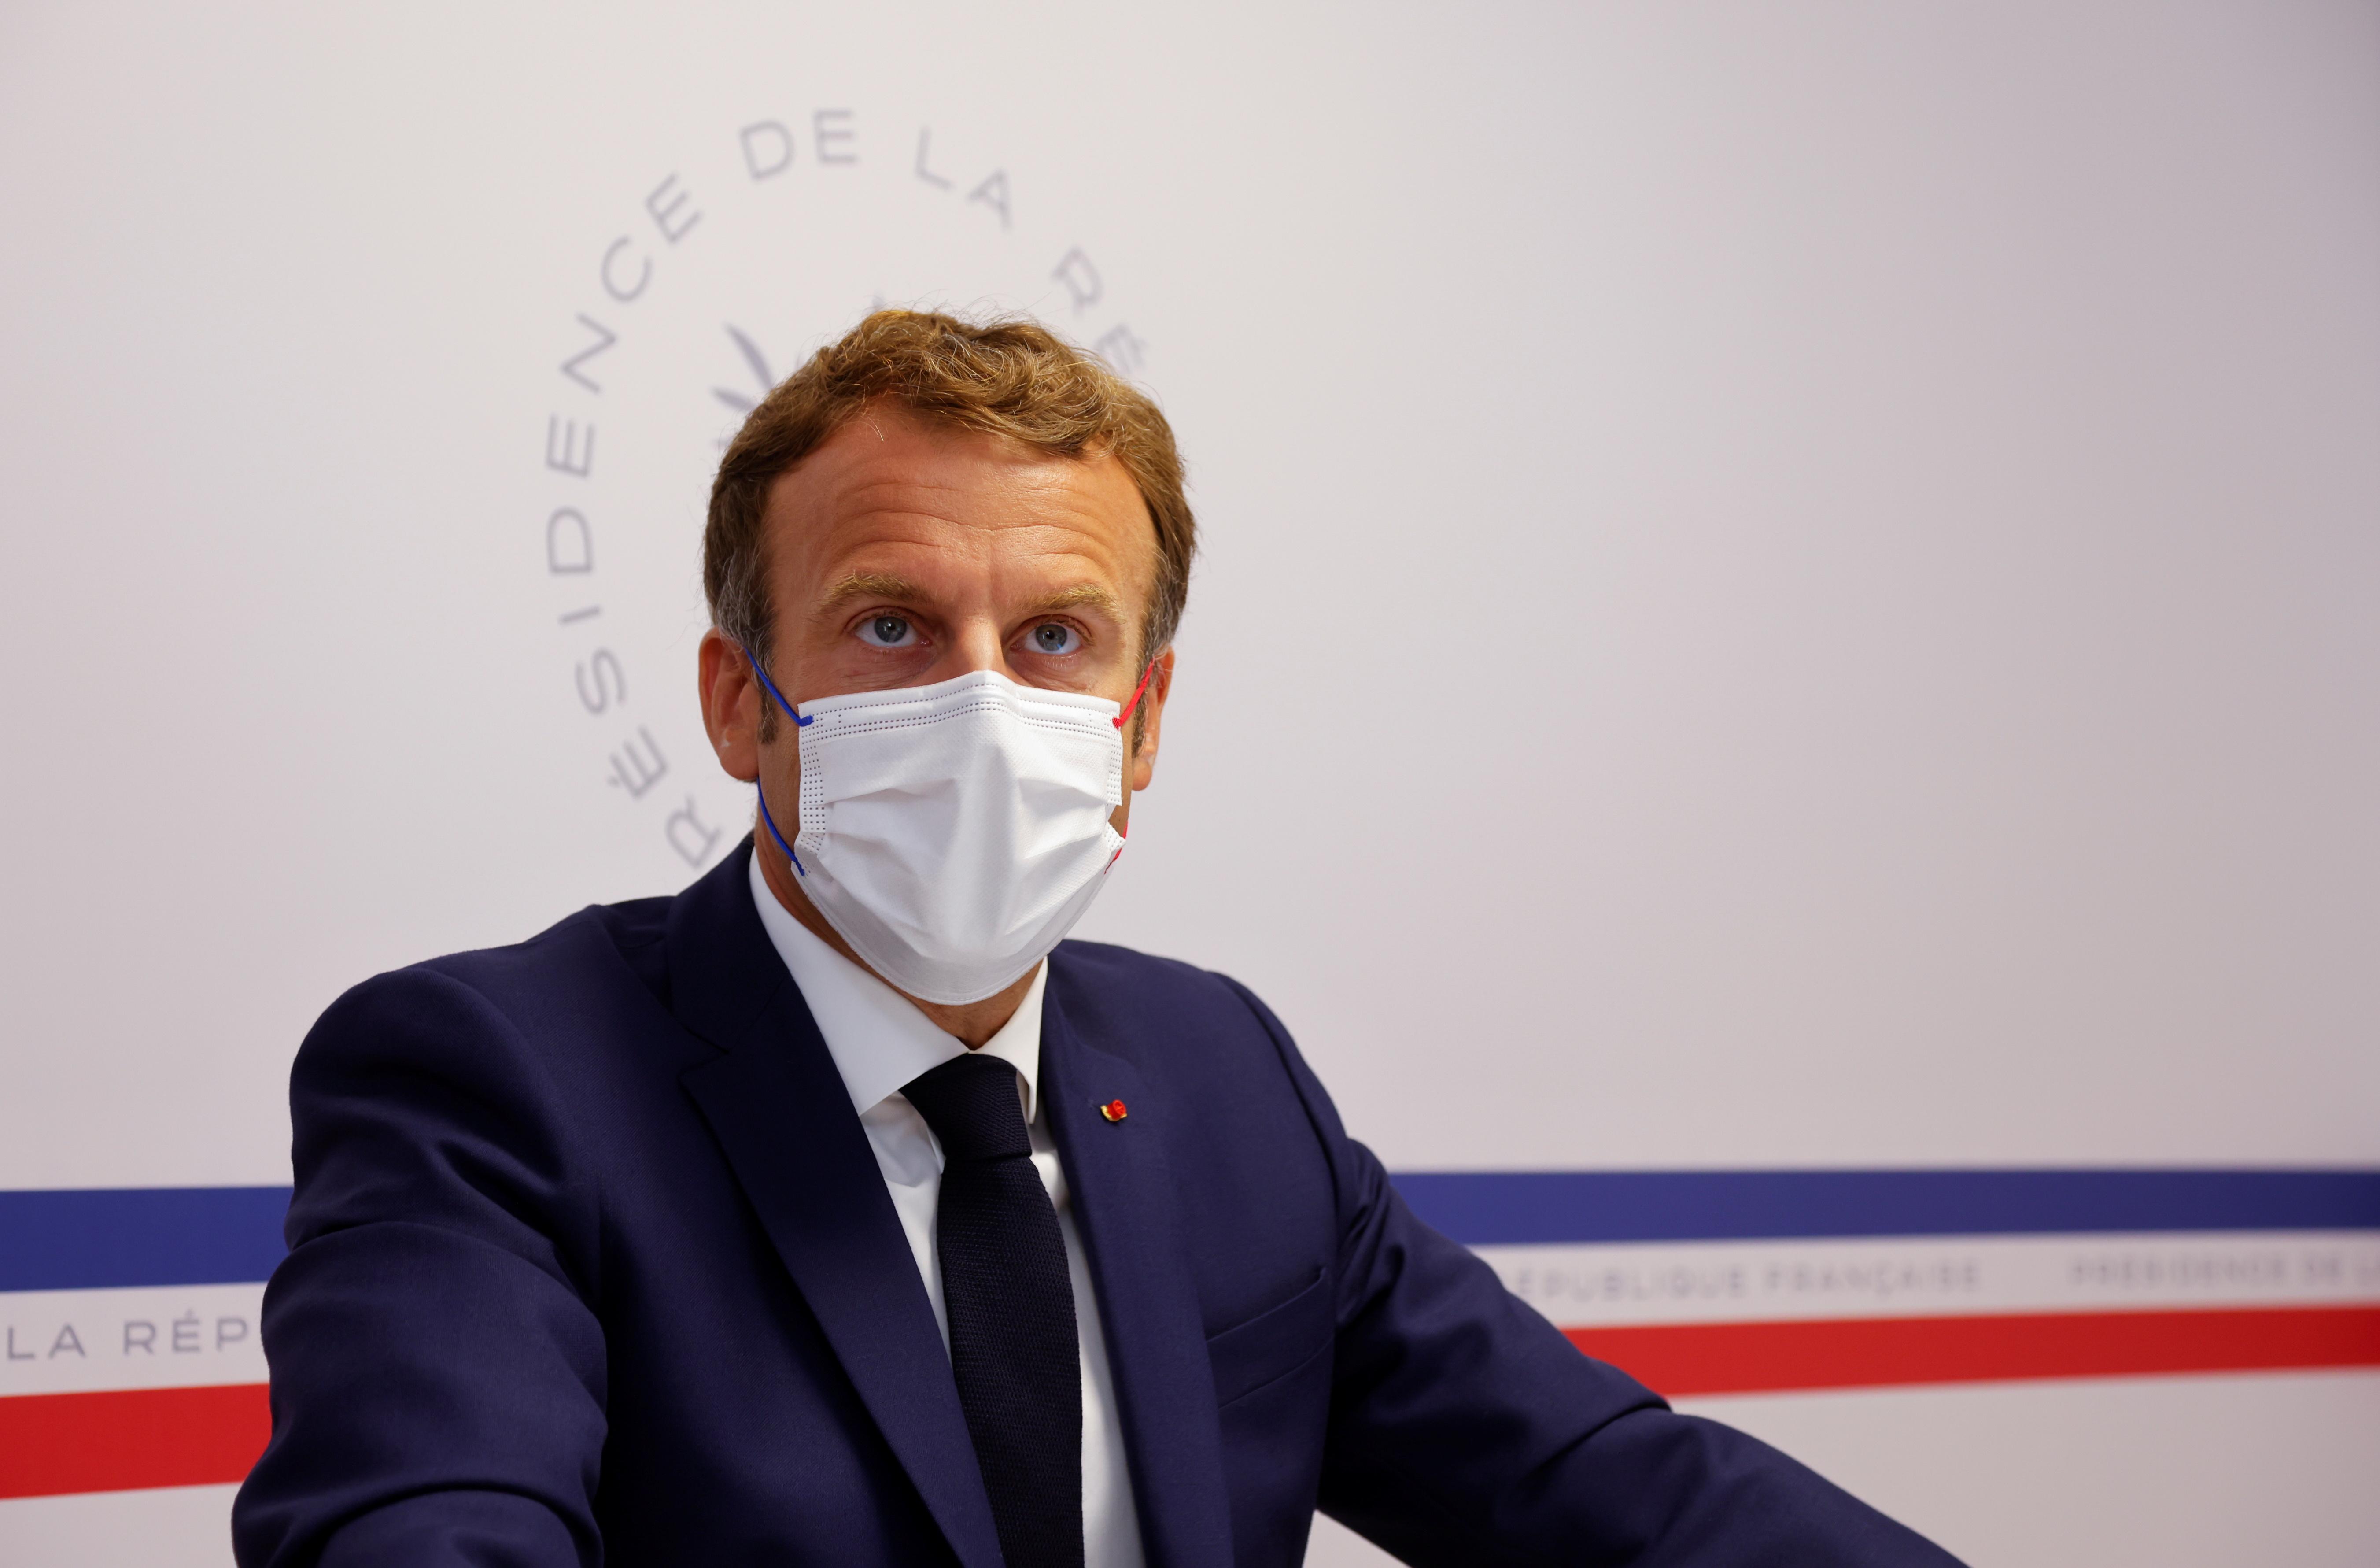 French President Emmanuel Macron attends a Defense Council at Fort de Bregancon in Bormes-les-Mimosas, France August 11, 2021.  REUTERS/Eric Gaillard/Pool